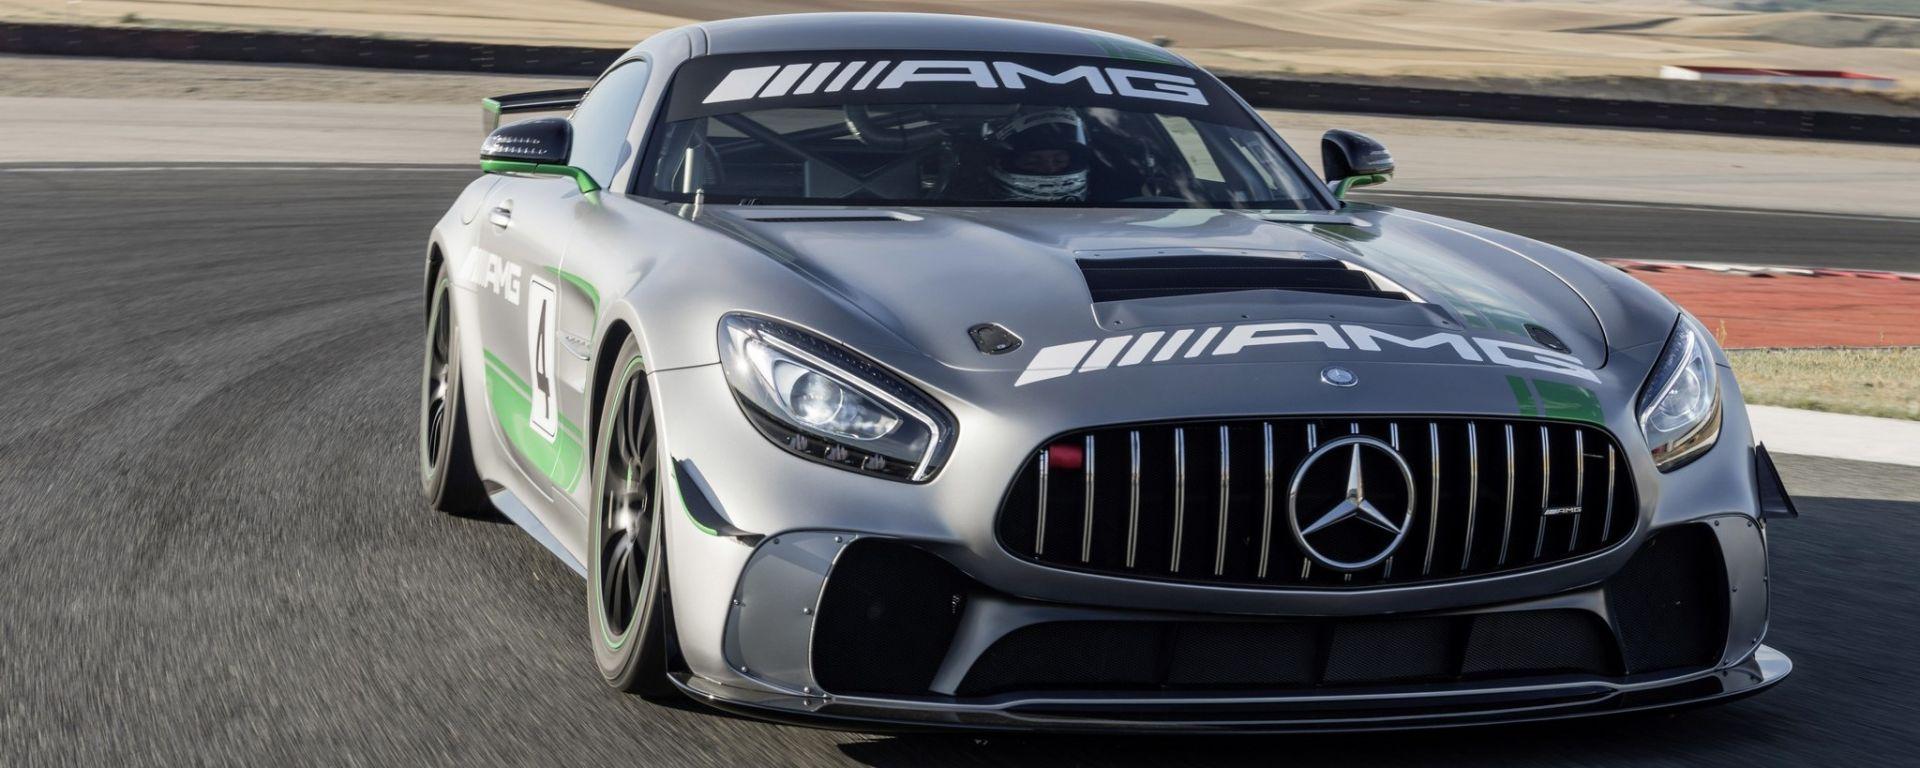 Mercedes AMG GT4 - visuale anteriore